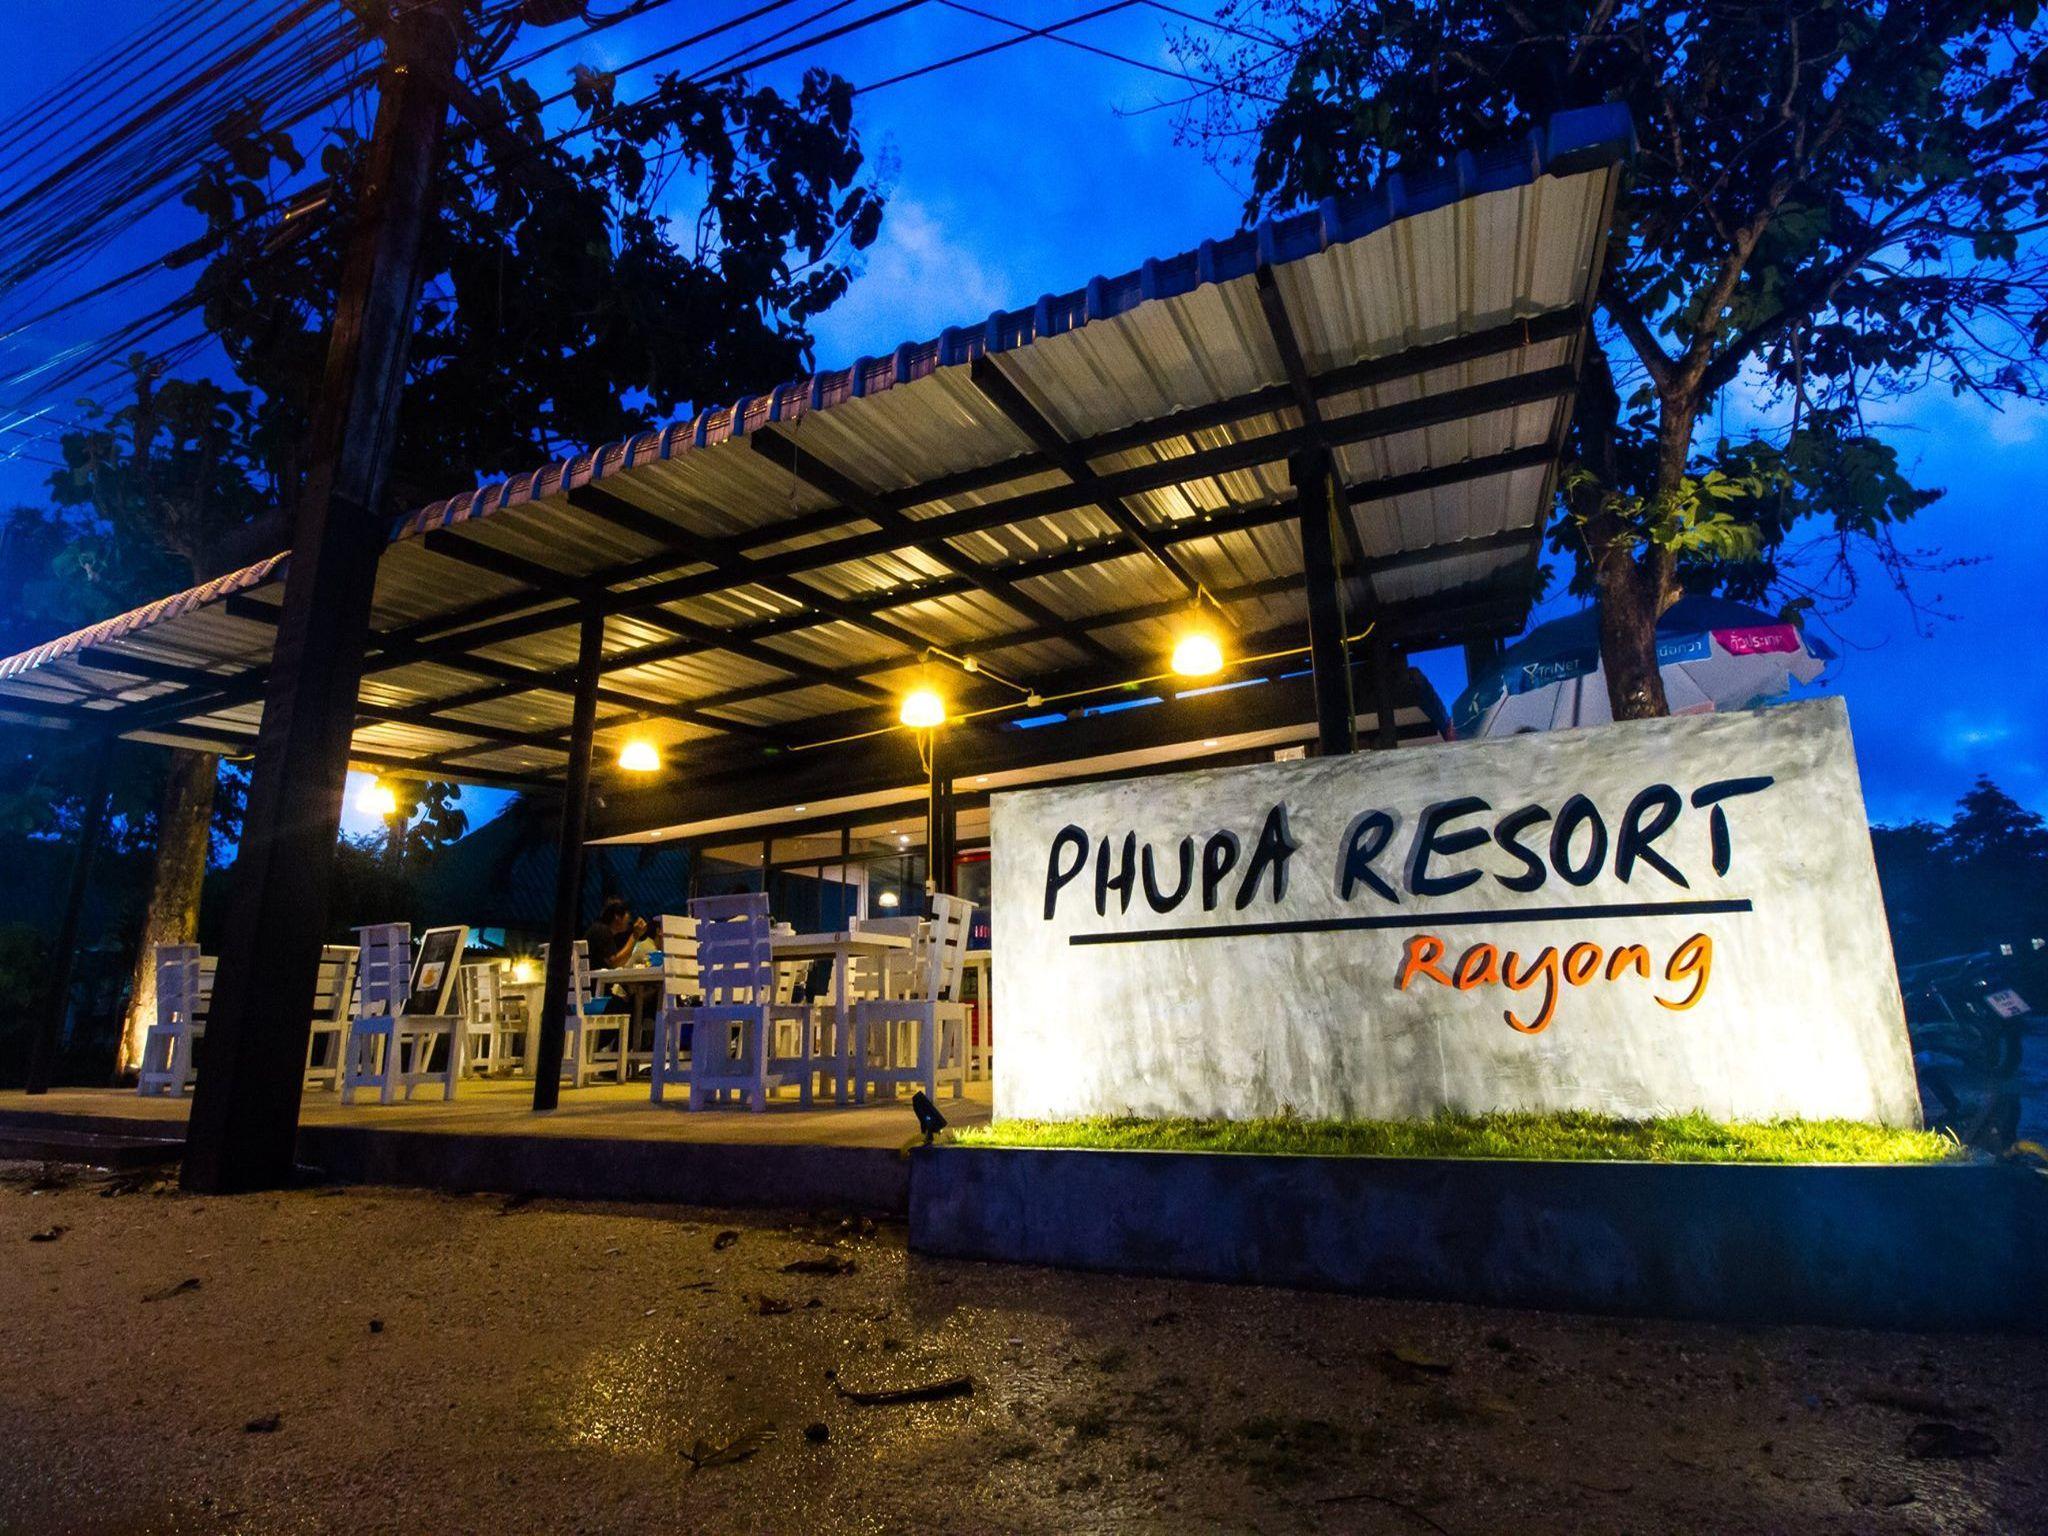 Phupa